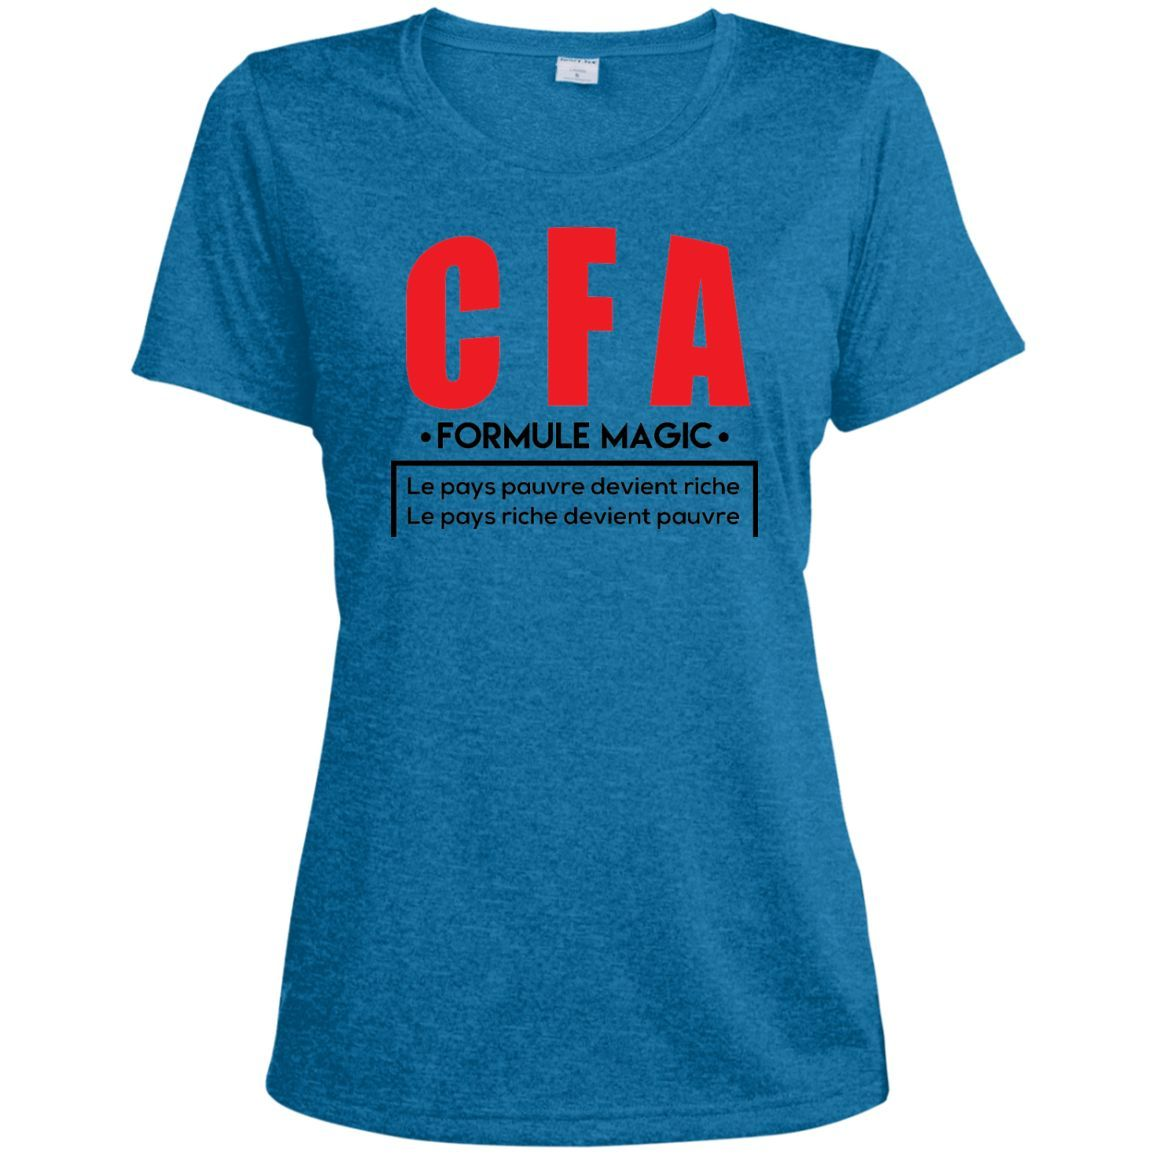 Afrikmax CFA Ladies Heather Dri-Fit Moisture-Wicking Tee